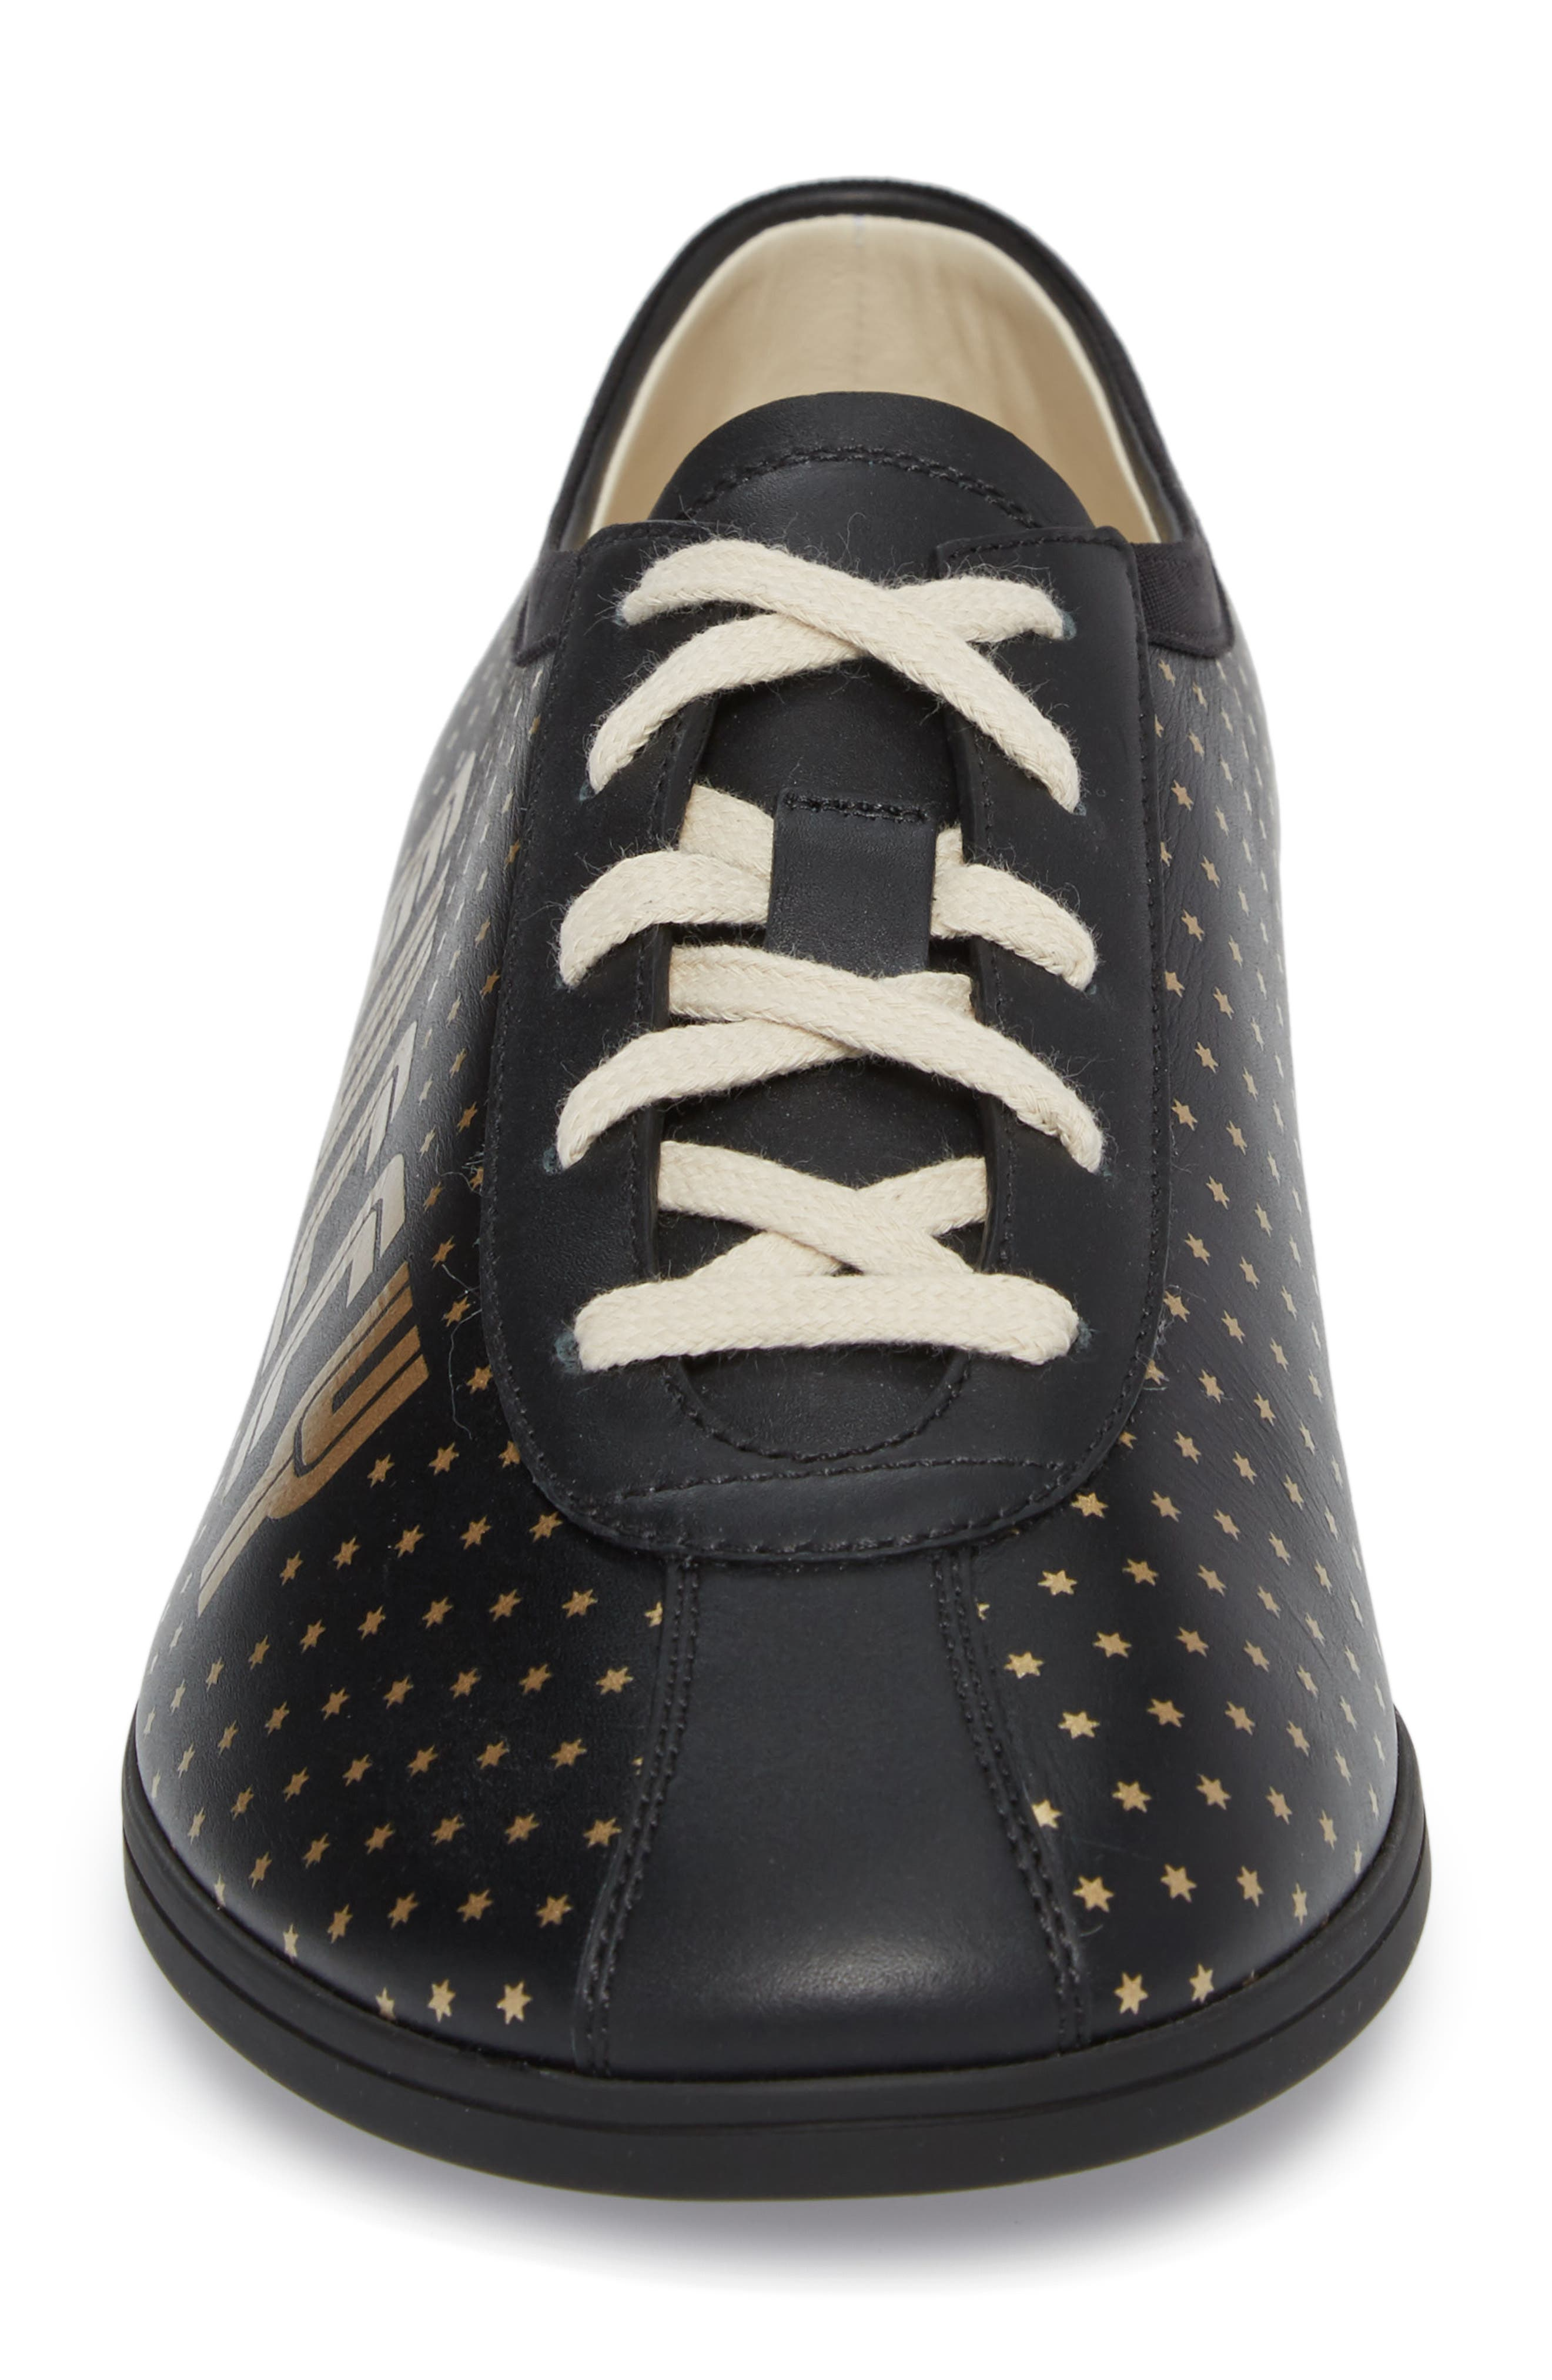 Falacer Guccy Low Top Sneaker,                             Alternate thumbnail 4, color,                             Black/ Tan